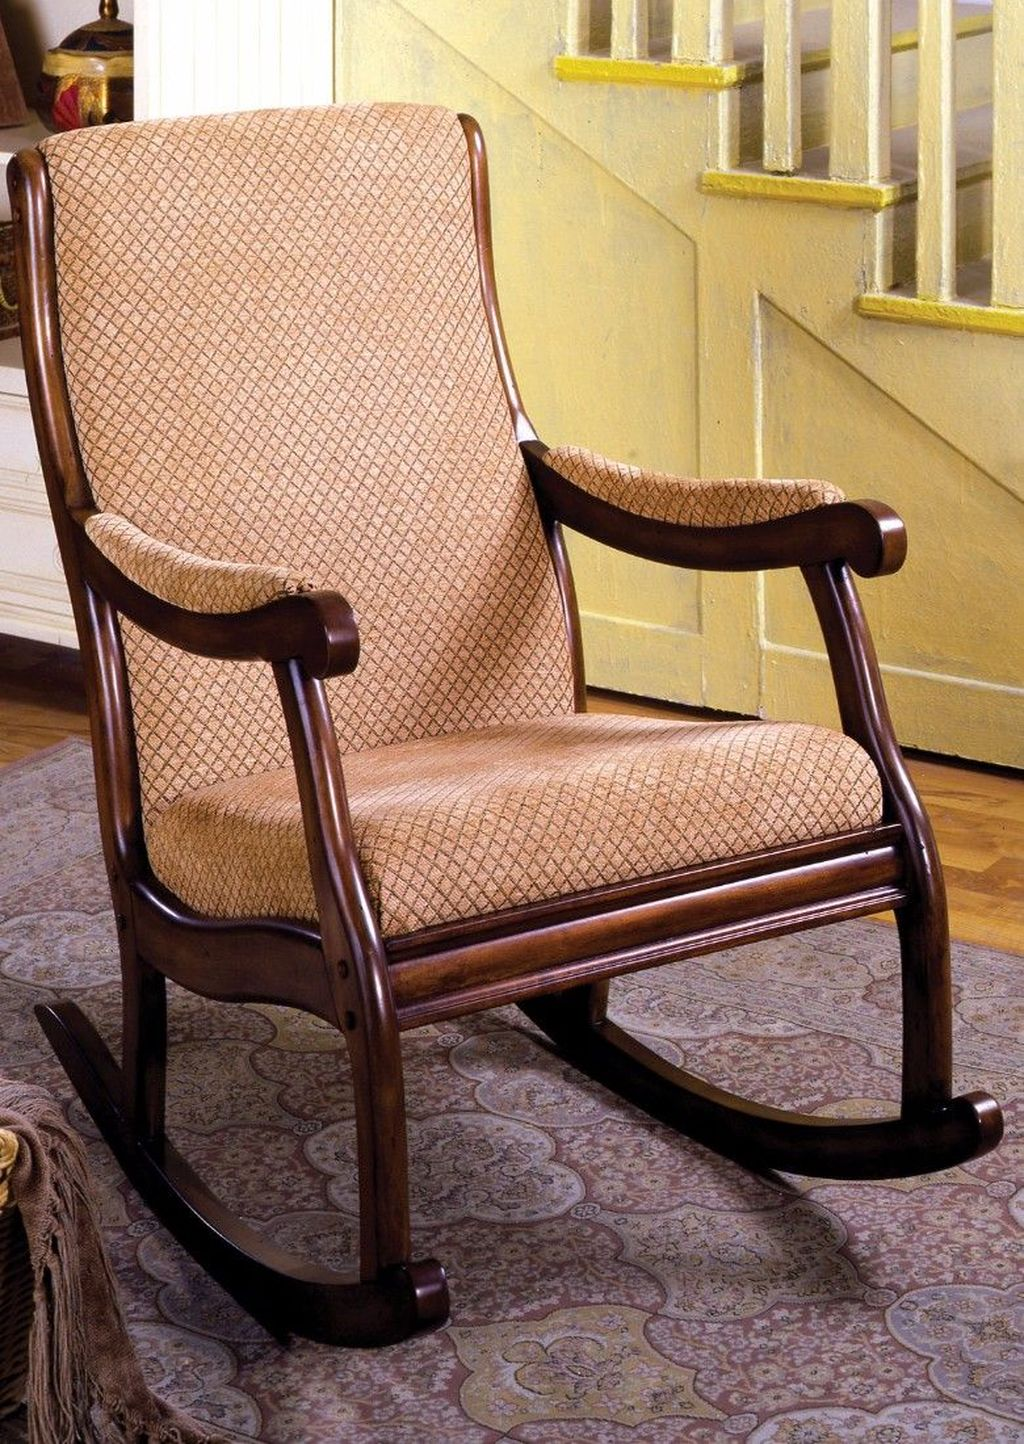 Amazing Rocking Chair Design Ideas 30